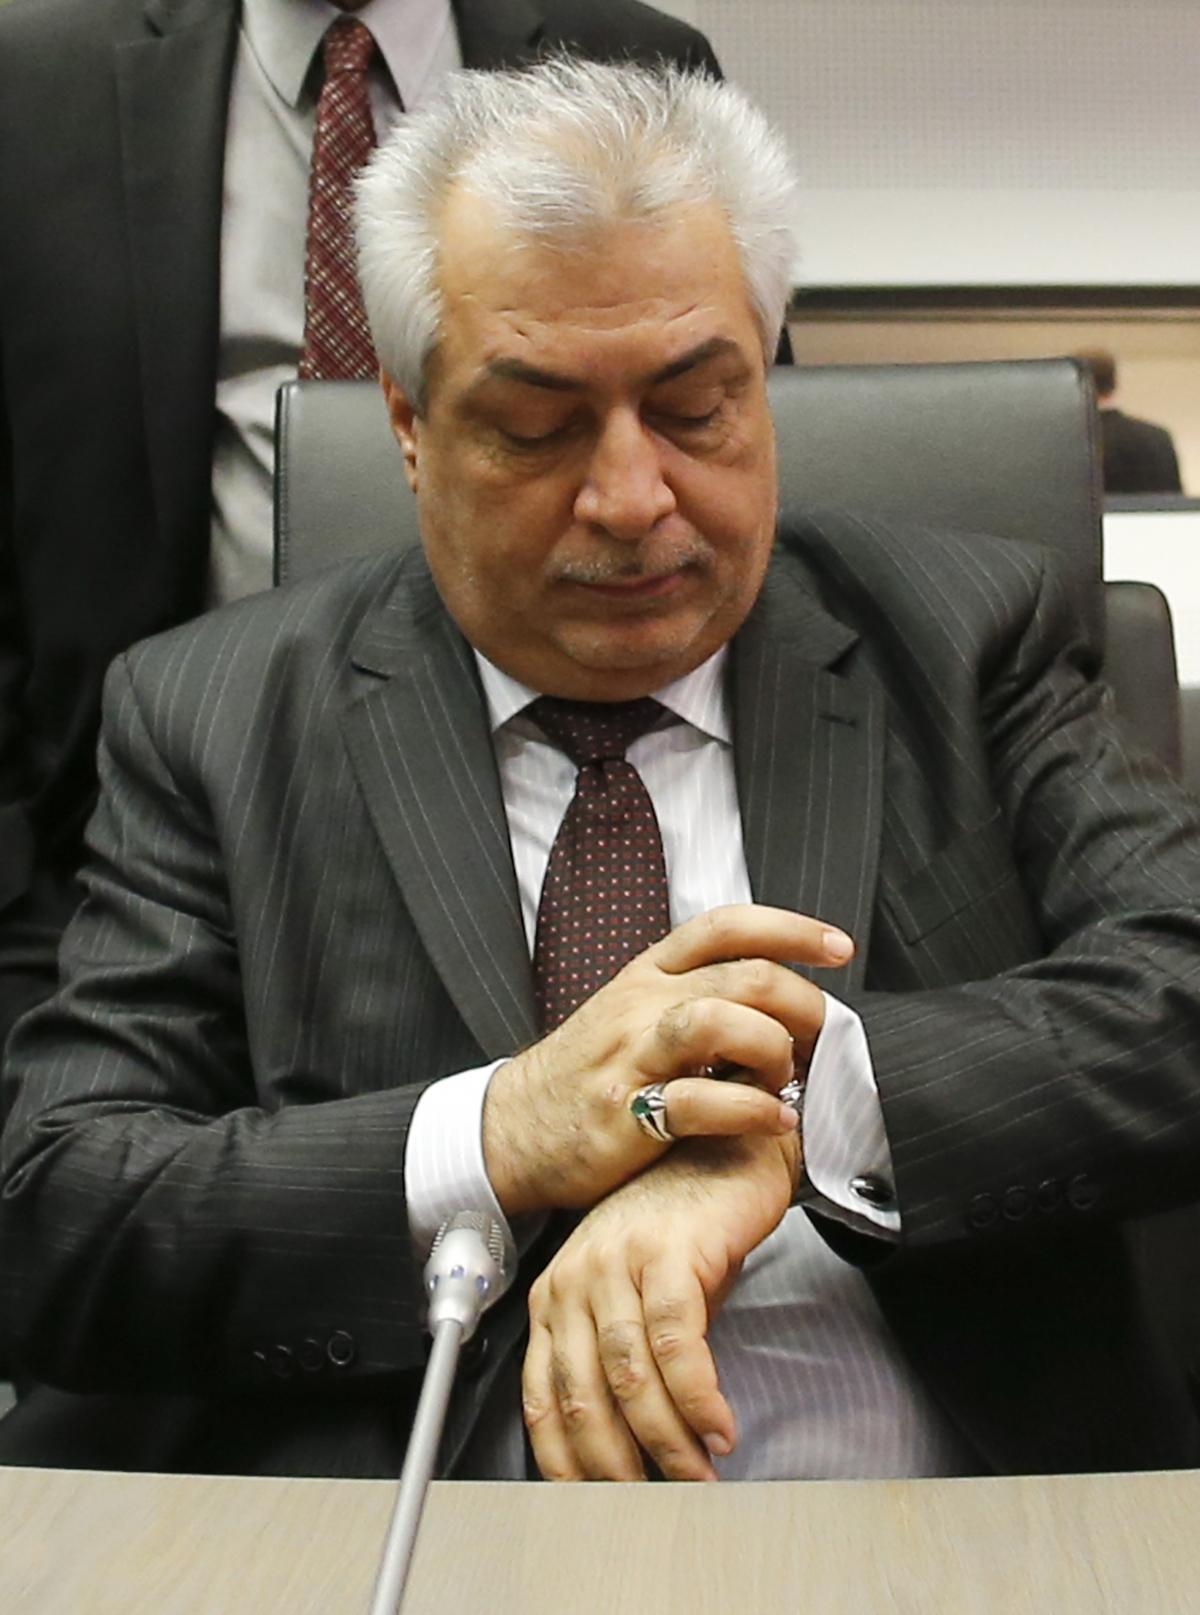 Iraq Oil Minister Abdul Kareem Luaibi